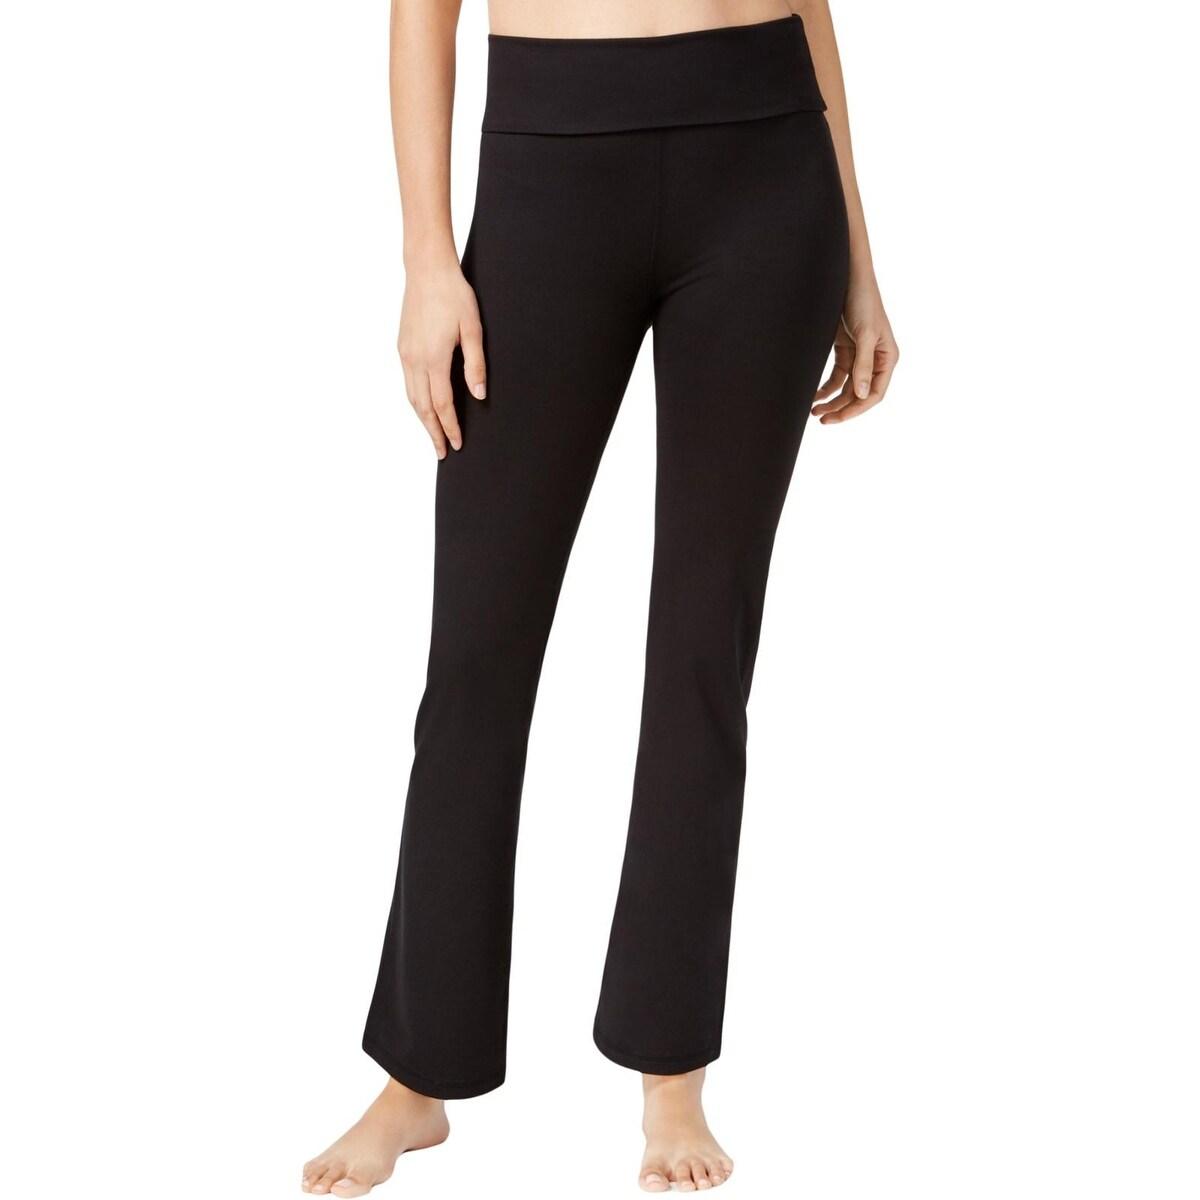 Gaiam Womens Om Nova Yoga Pants Bootcut